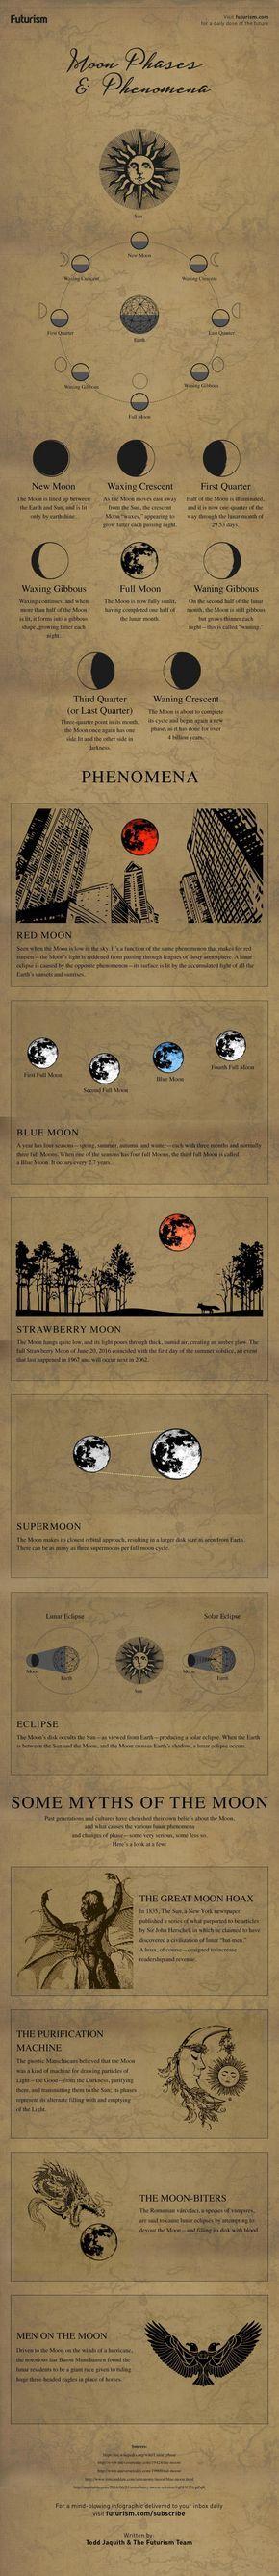 Moon Phases and Phenomena [INFOGRAPHIC]